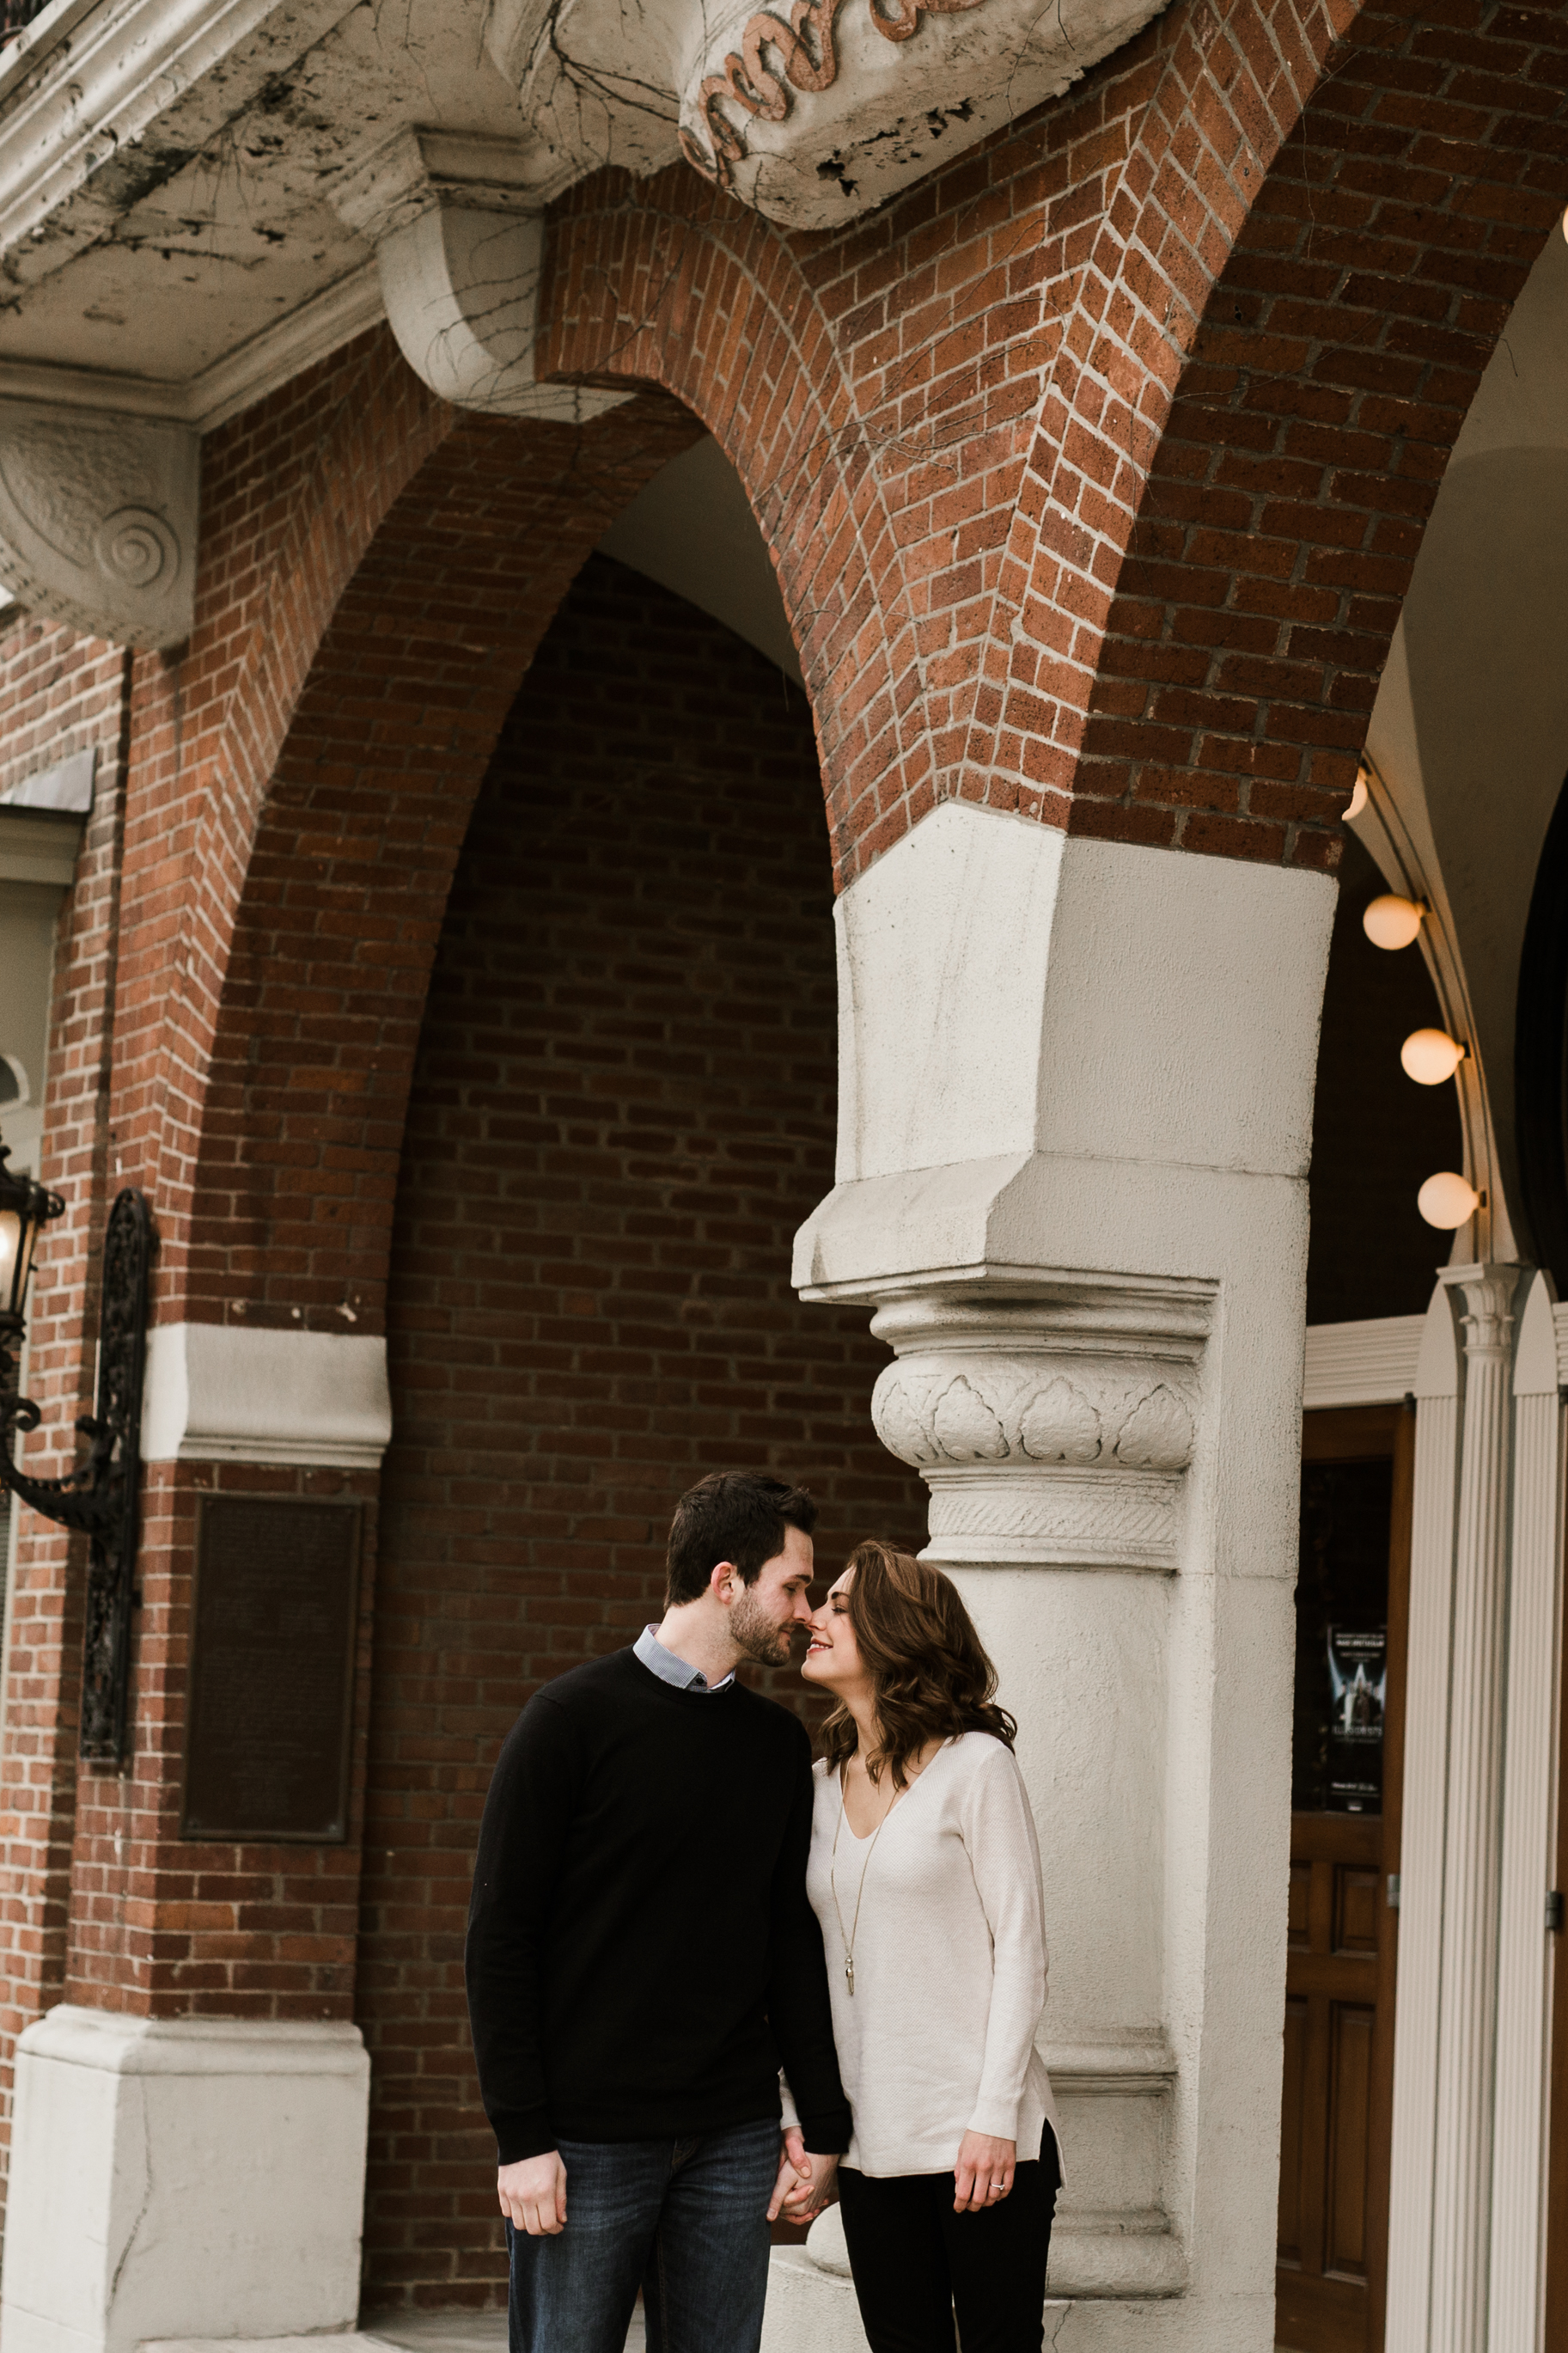 Ellen & Lee Engagement 2018 WEBSITE SP Crystal Ludwick Photo (52 of 54).jpg